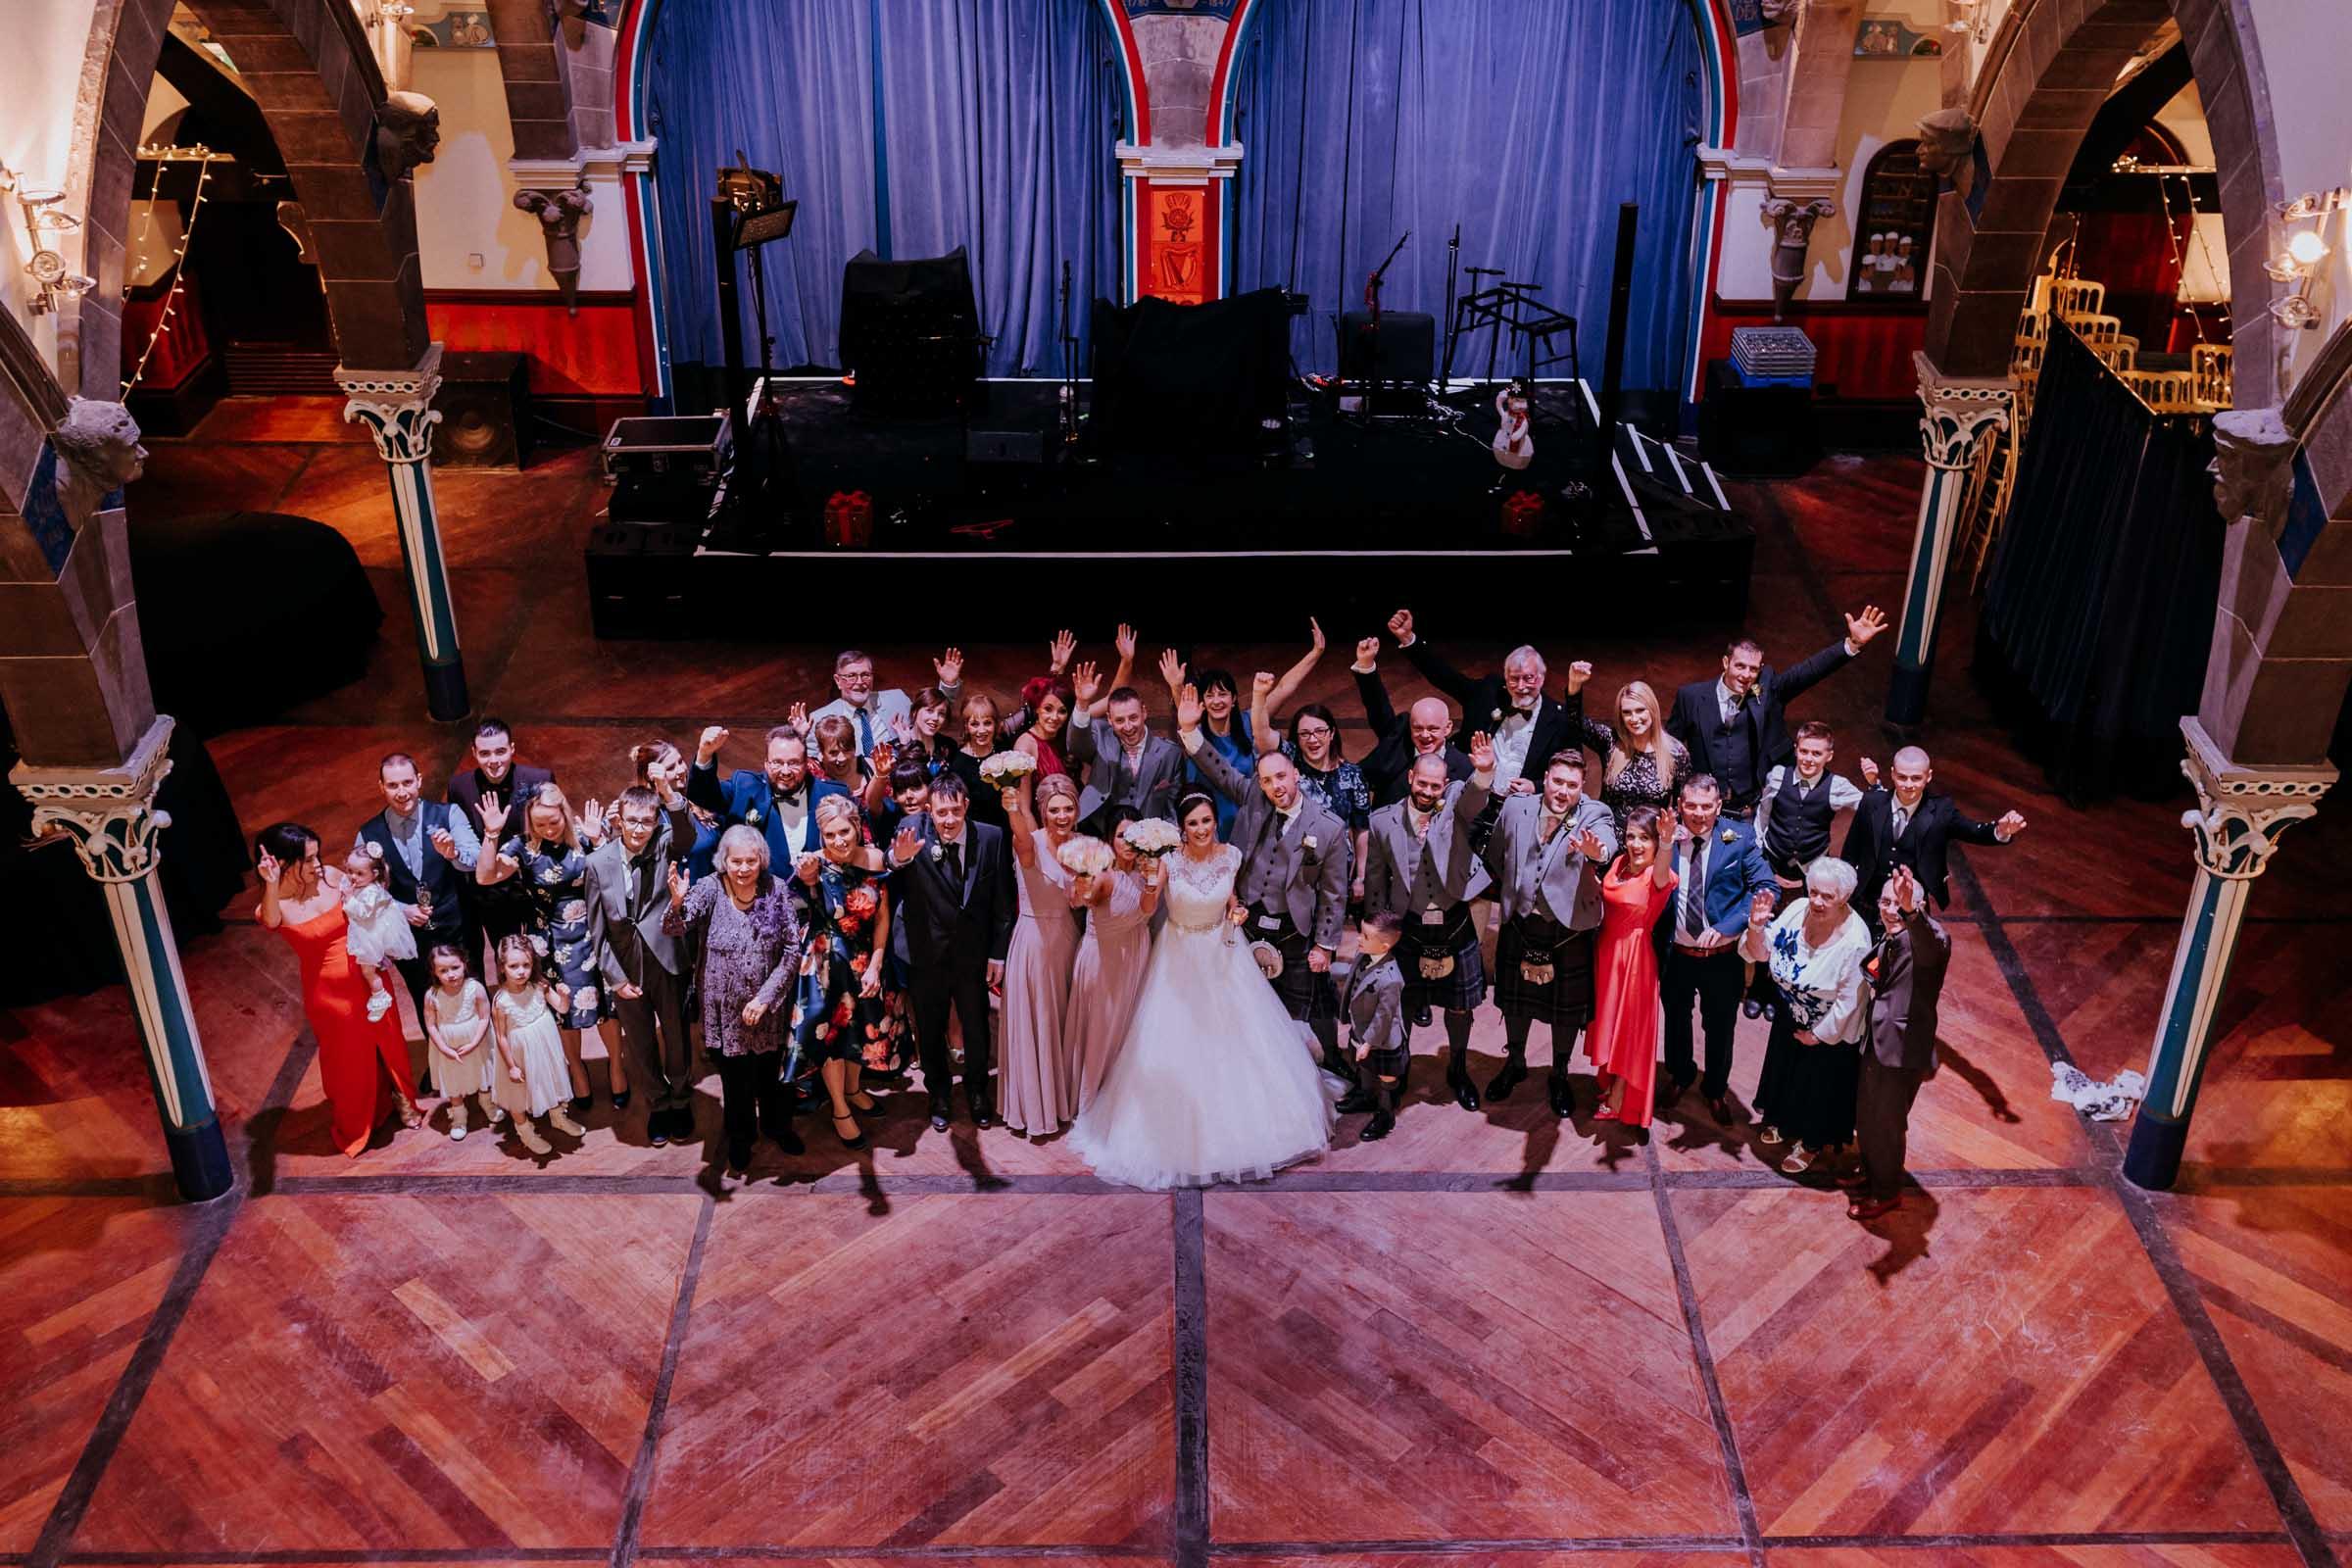 Oran-Mor-Wedding-Photographer-DearlyPhotography (24 of 55).jpg